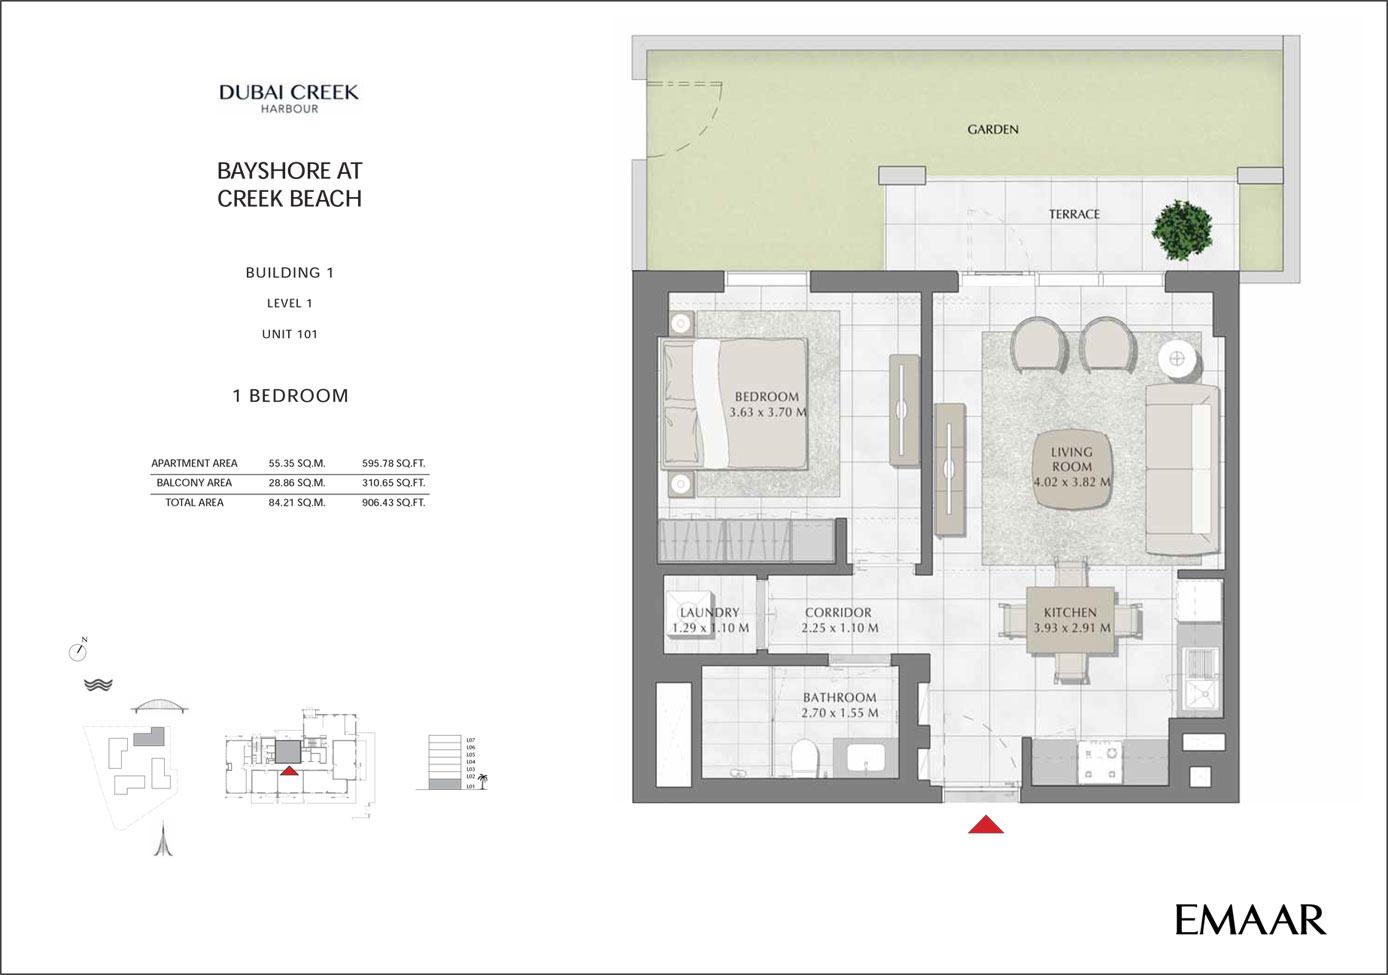 Building 1 - 1 Bedroom Level 1 Unit 101, Size 906 sq ft